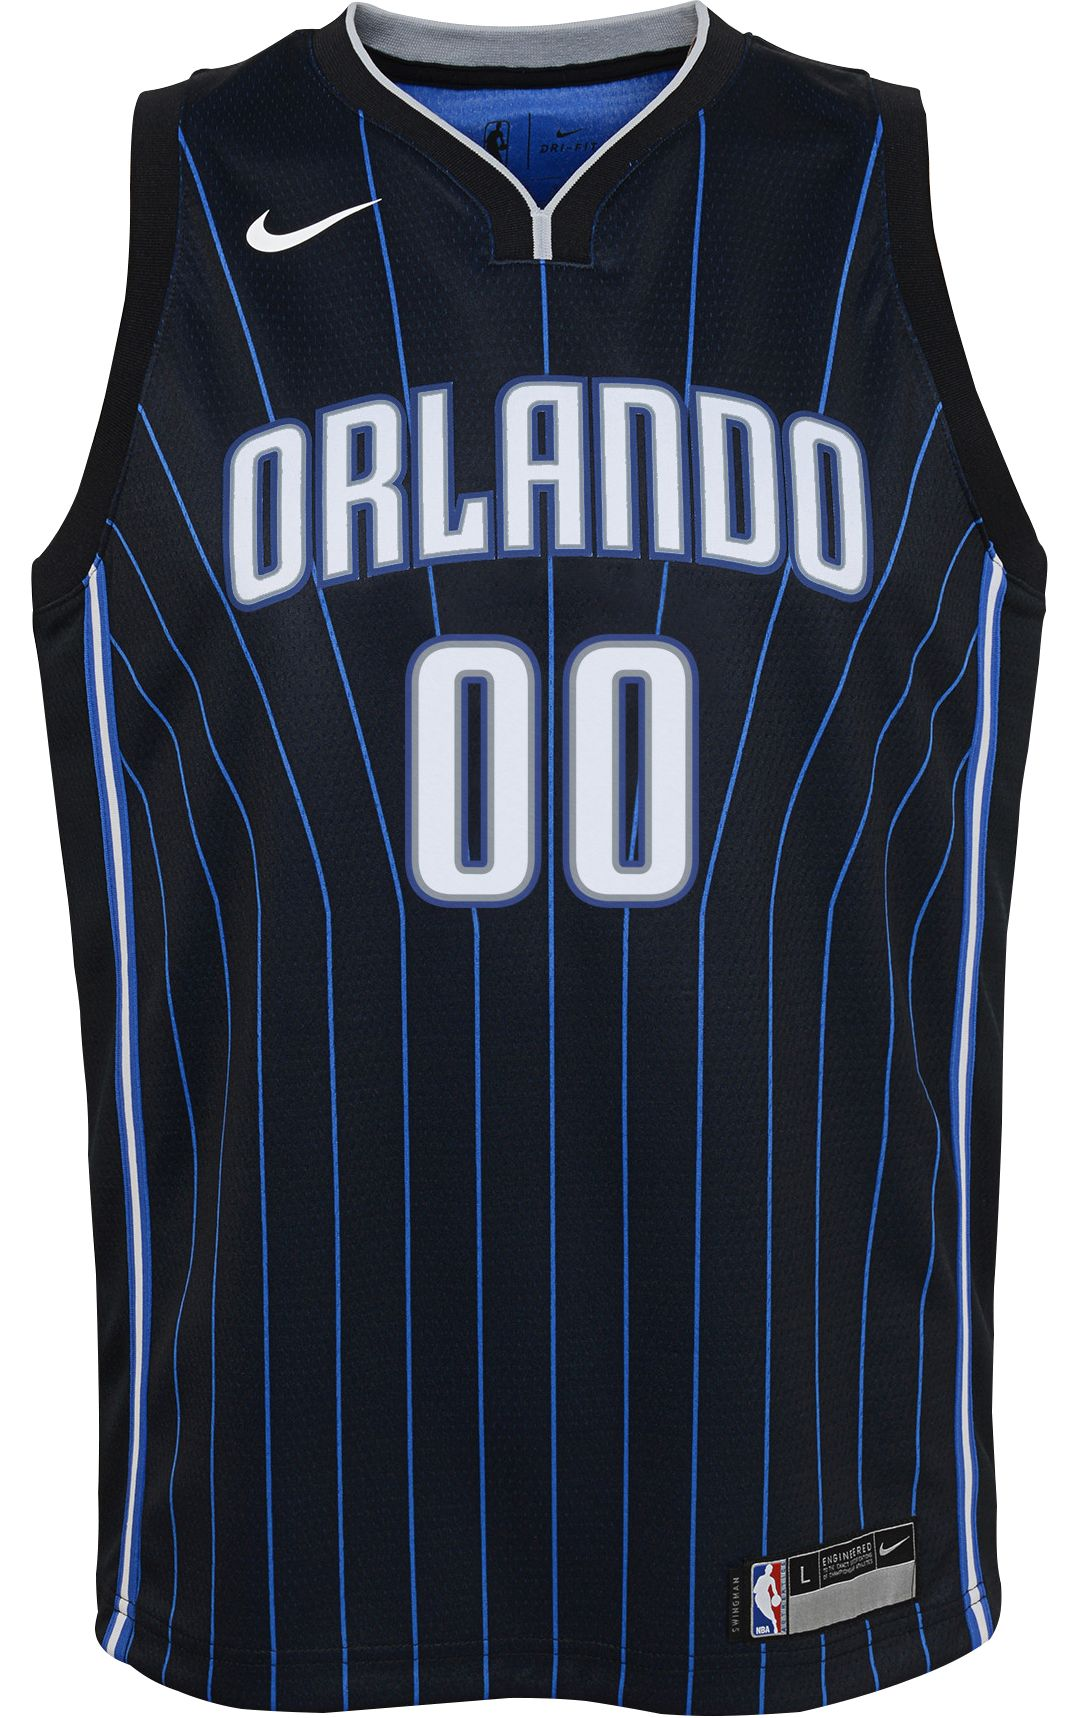 new product 1b69d b69a0 Nike Youth Orlando Magic Aaron Gordon #00 Black Dri-FIT Swingman Jersey